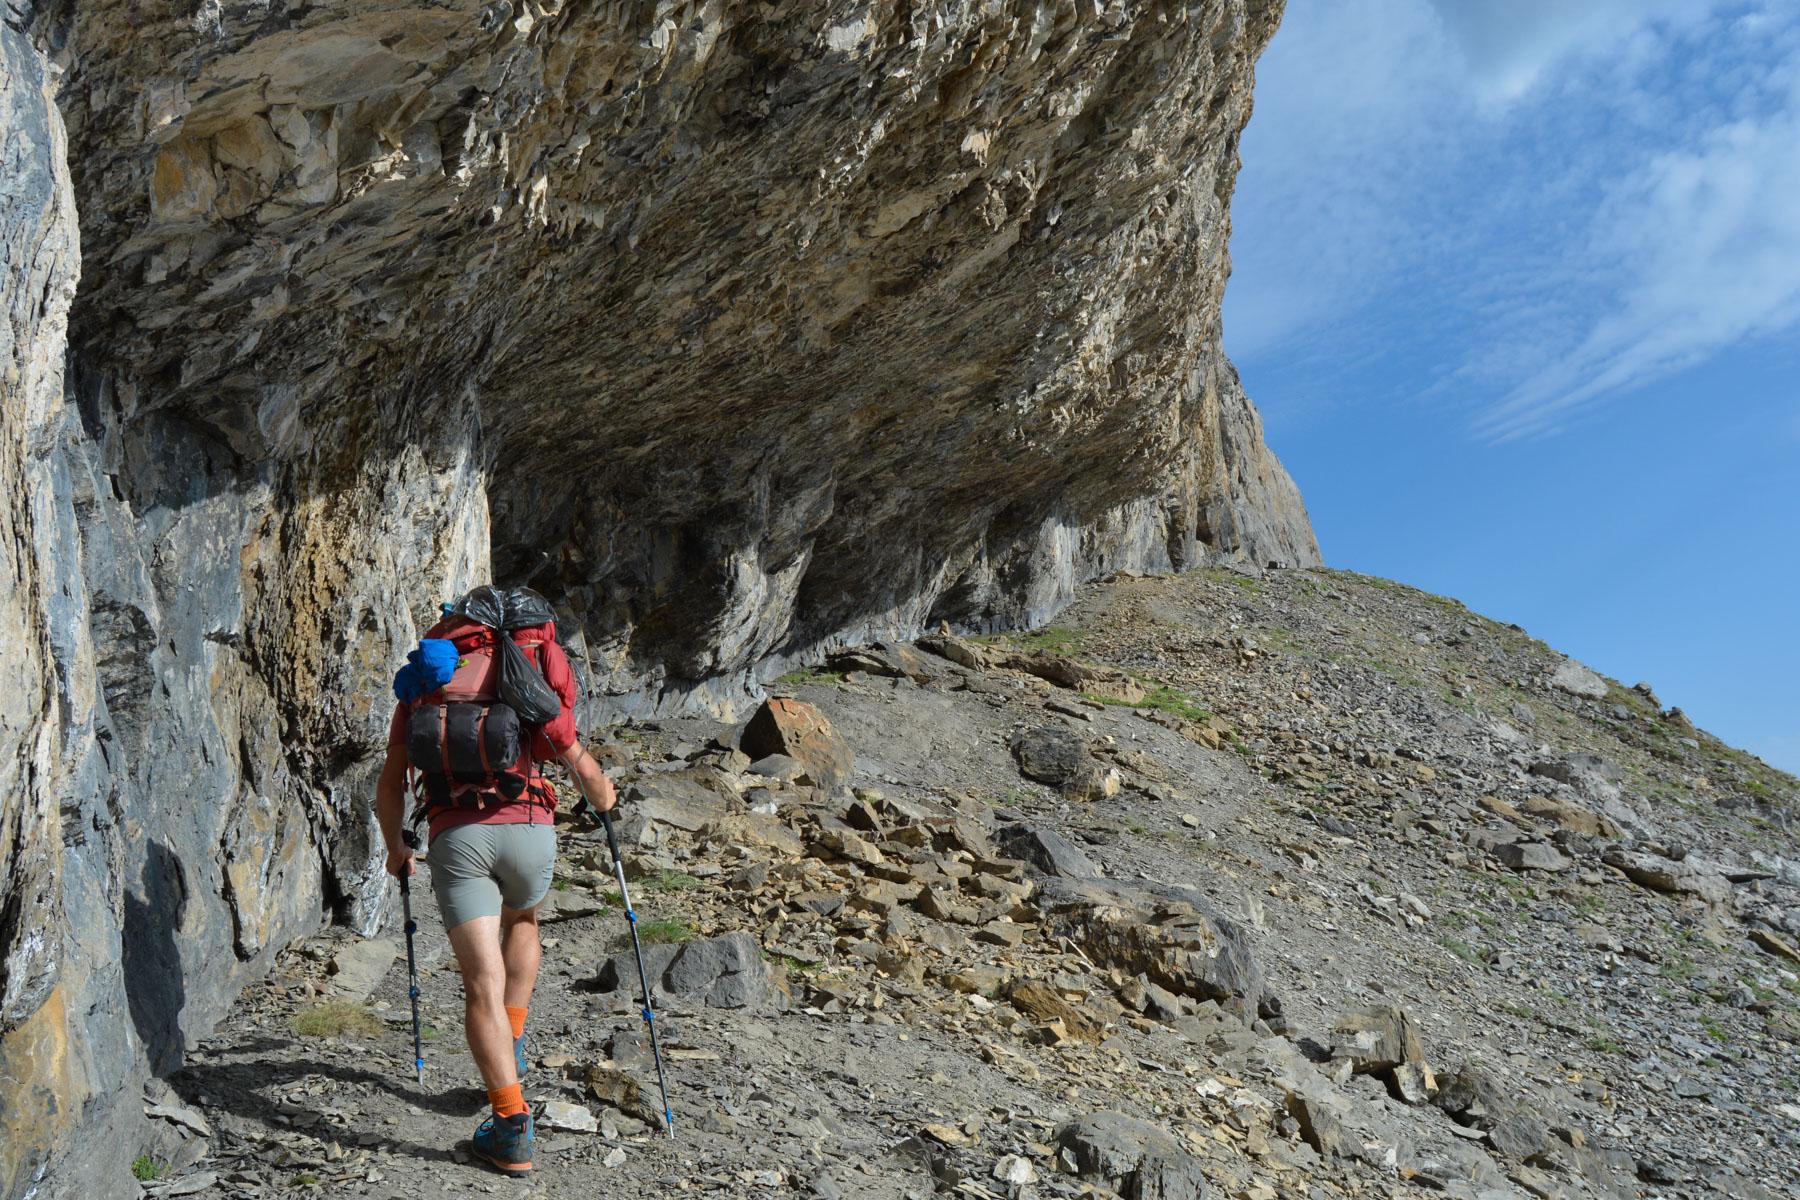 Monte Perdido et Faja de las Flores, Jour 1, Ordesa, Aragon, Espagne 36